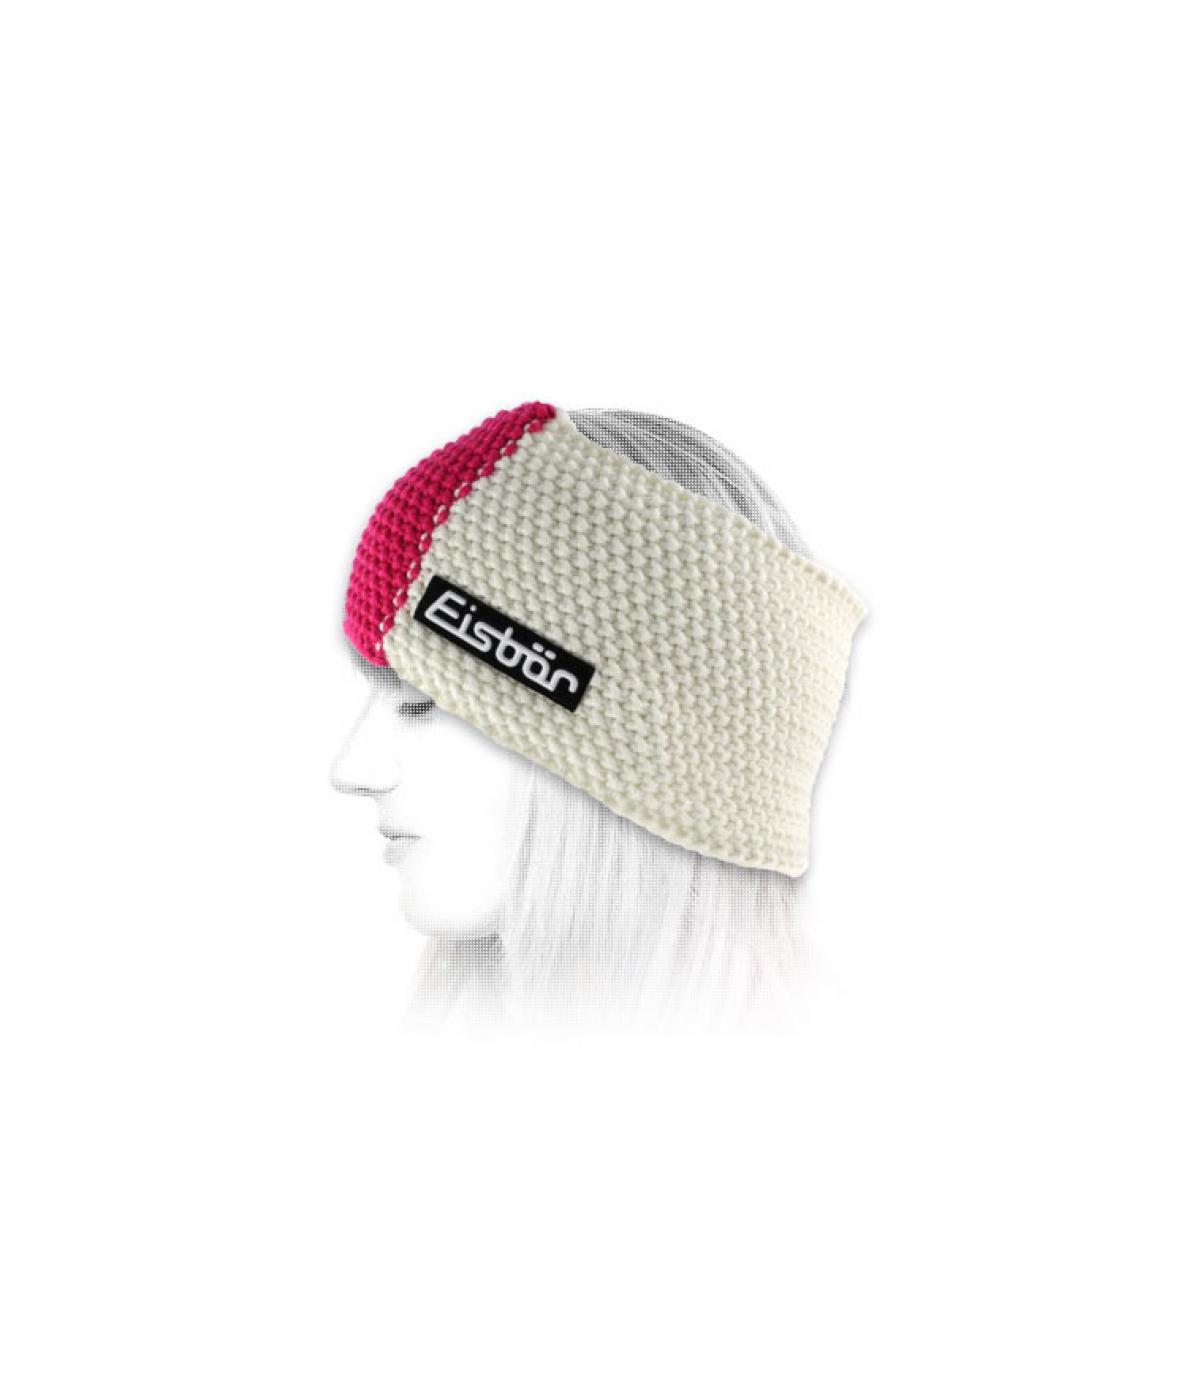 Eisbar pink headband